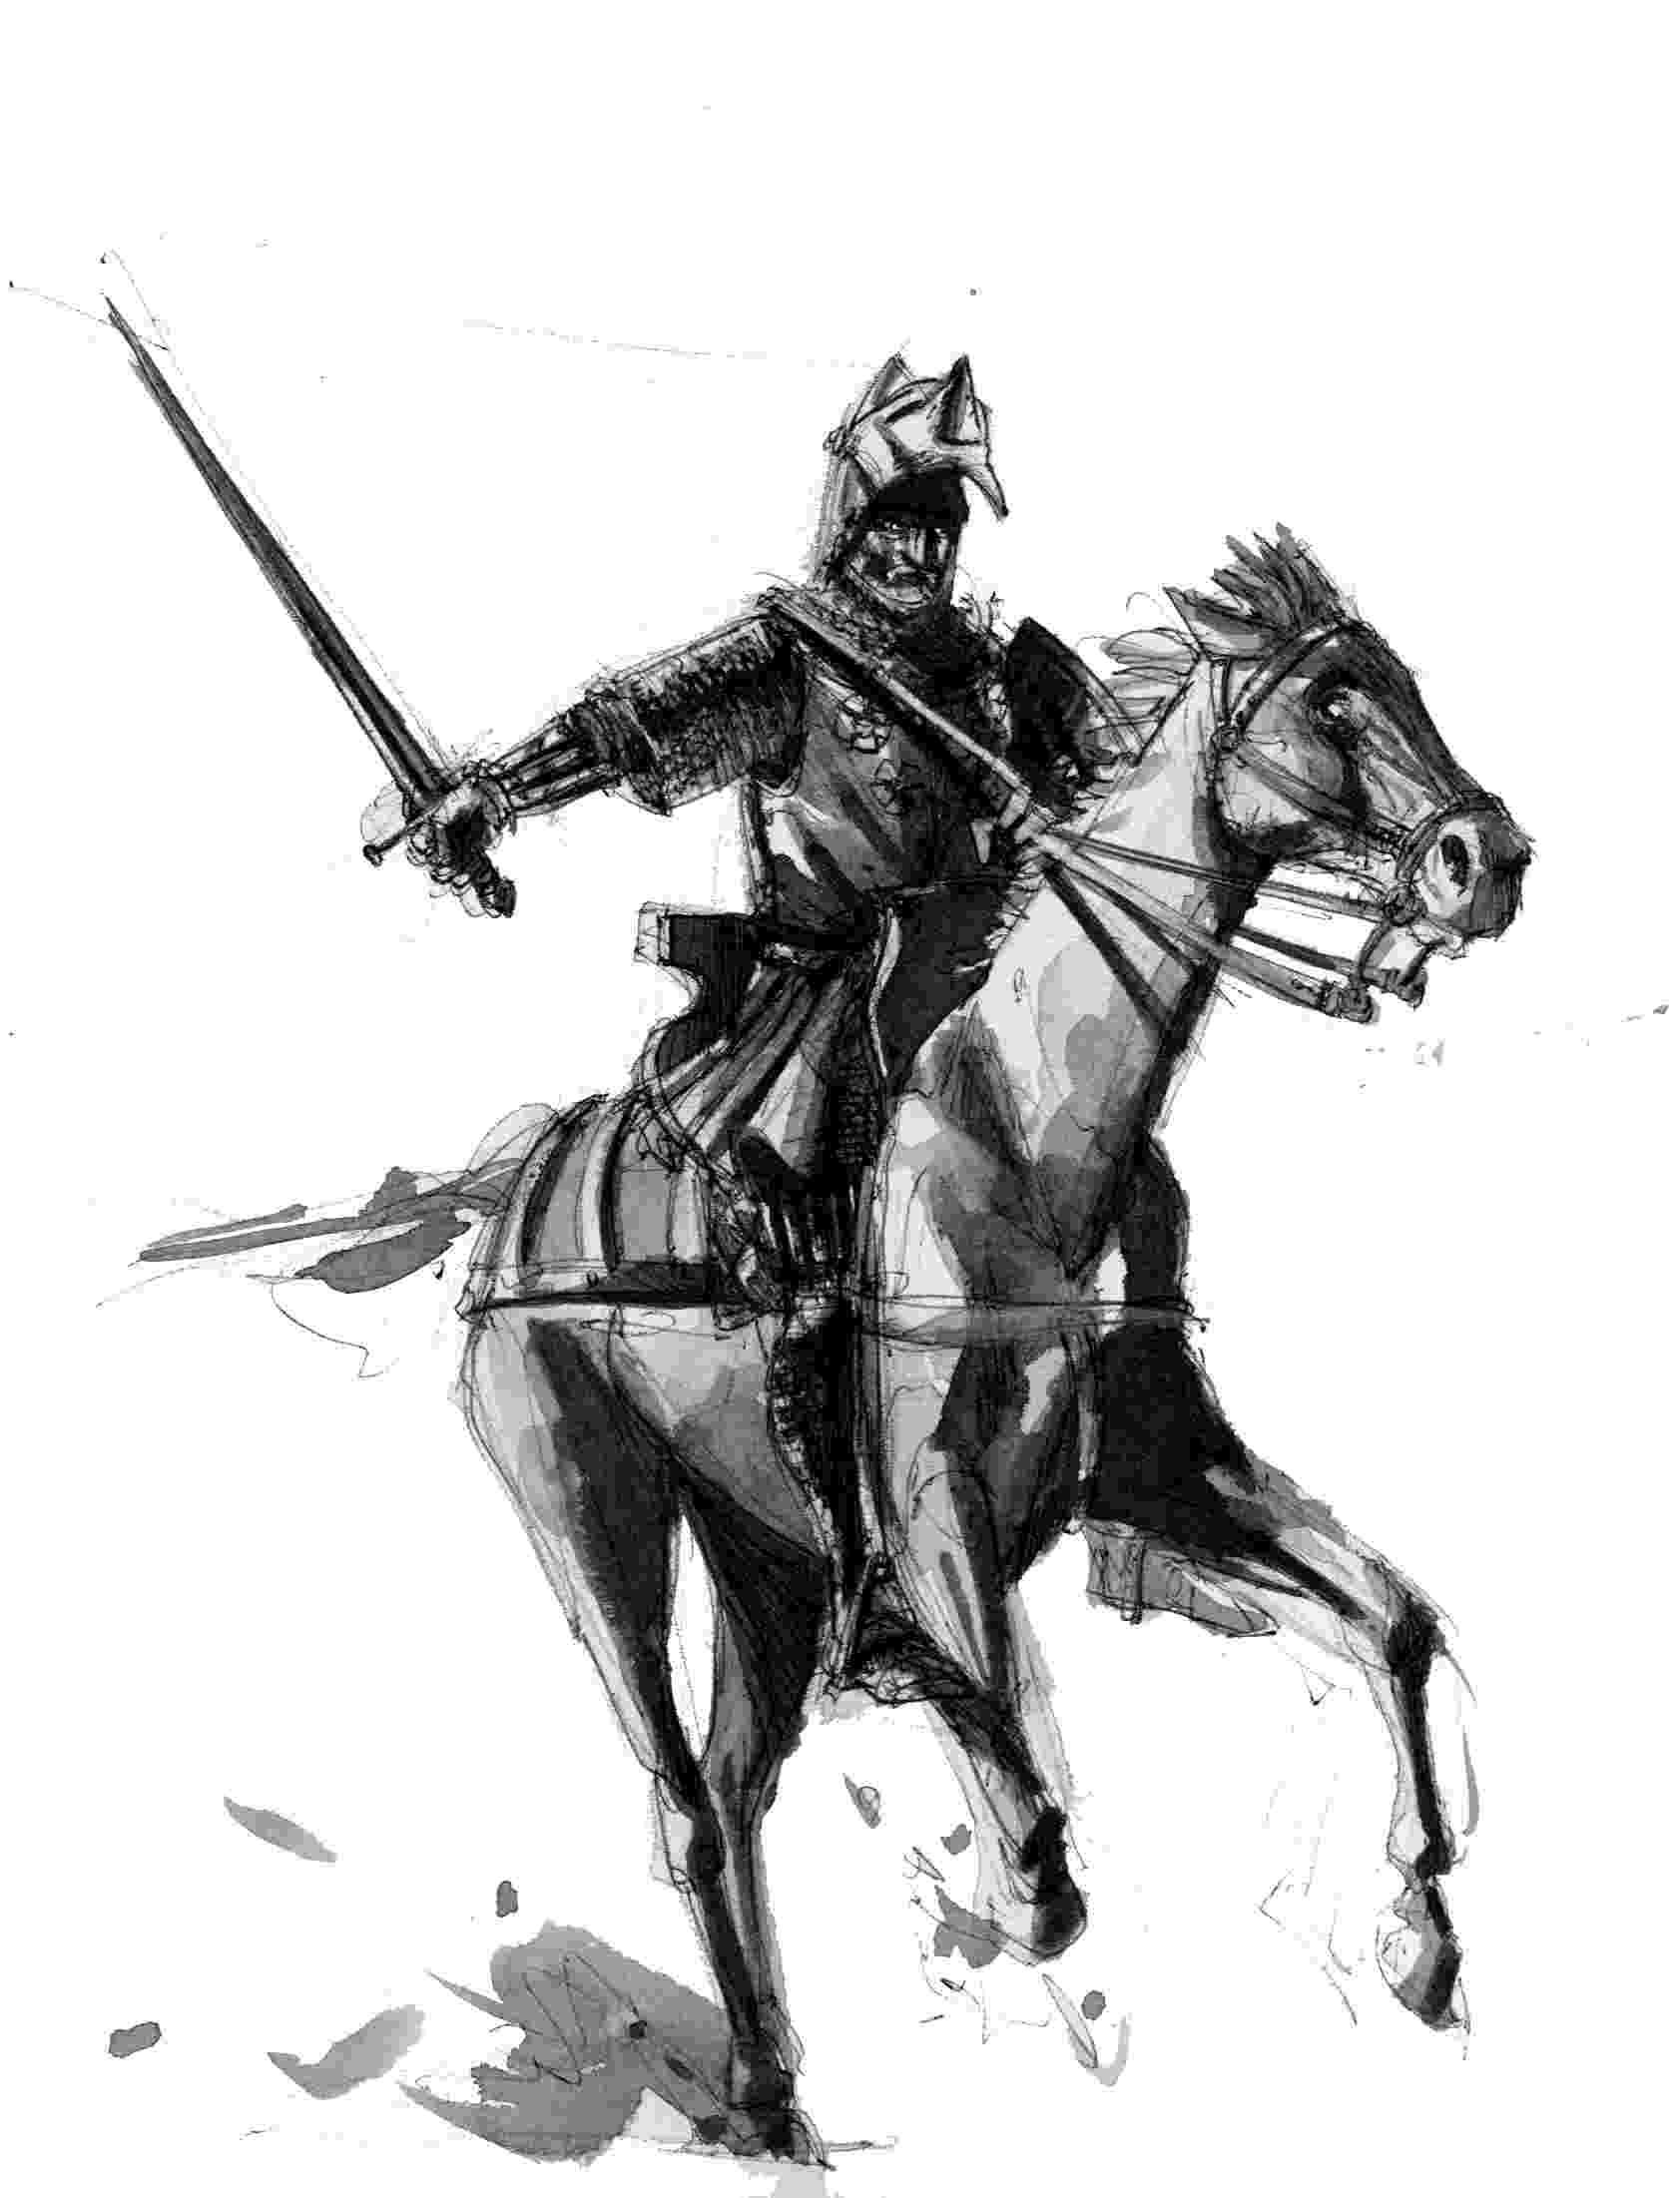 knight on horseback knight on horseback drawing at getdrawingscom free for horseback on knight